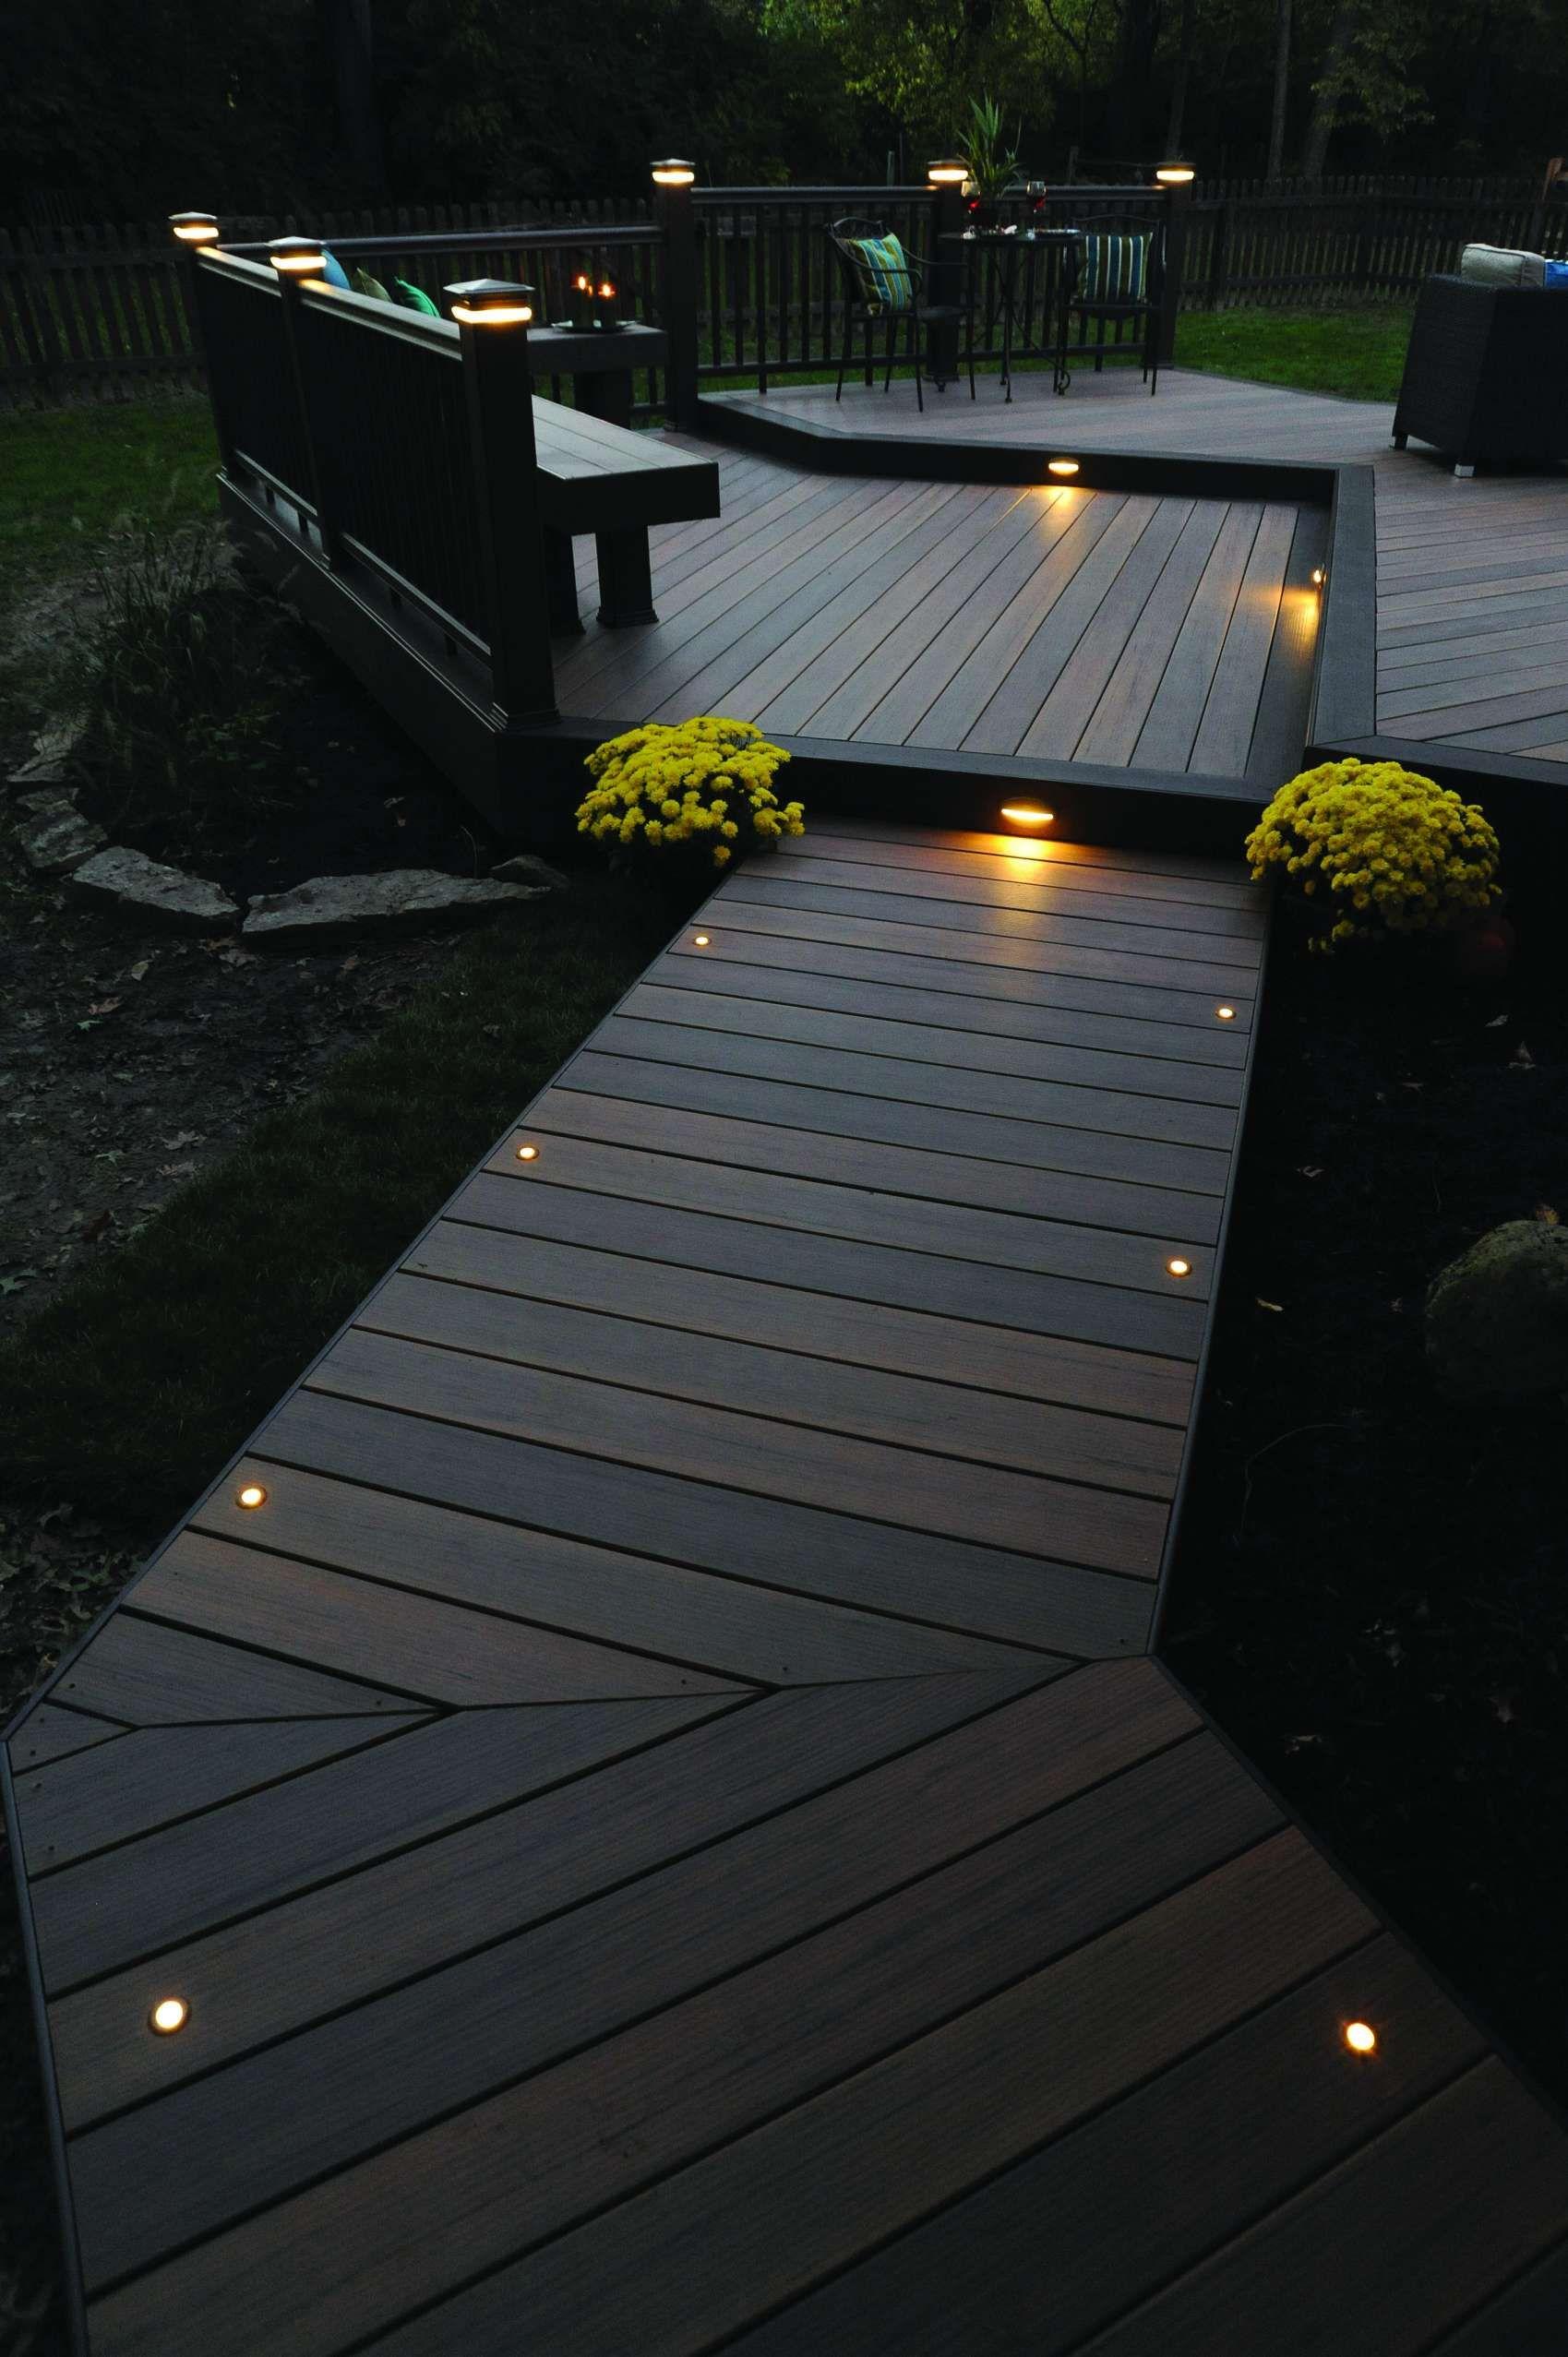 16 Terrasse Led Beleuchtung 16 Terrasse Led Beleuchtung Terrasse Led Beleuchtung Terrasse Led Beleuchtung Terrasse Backyard Porch Design Backyard Lighting